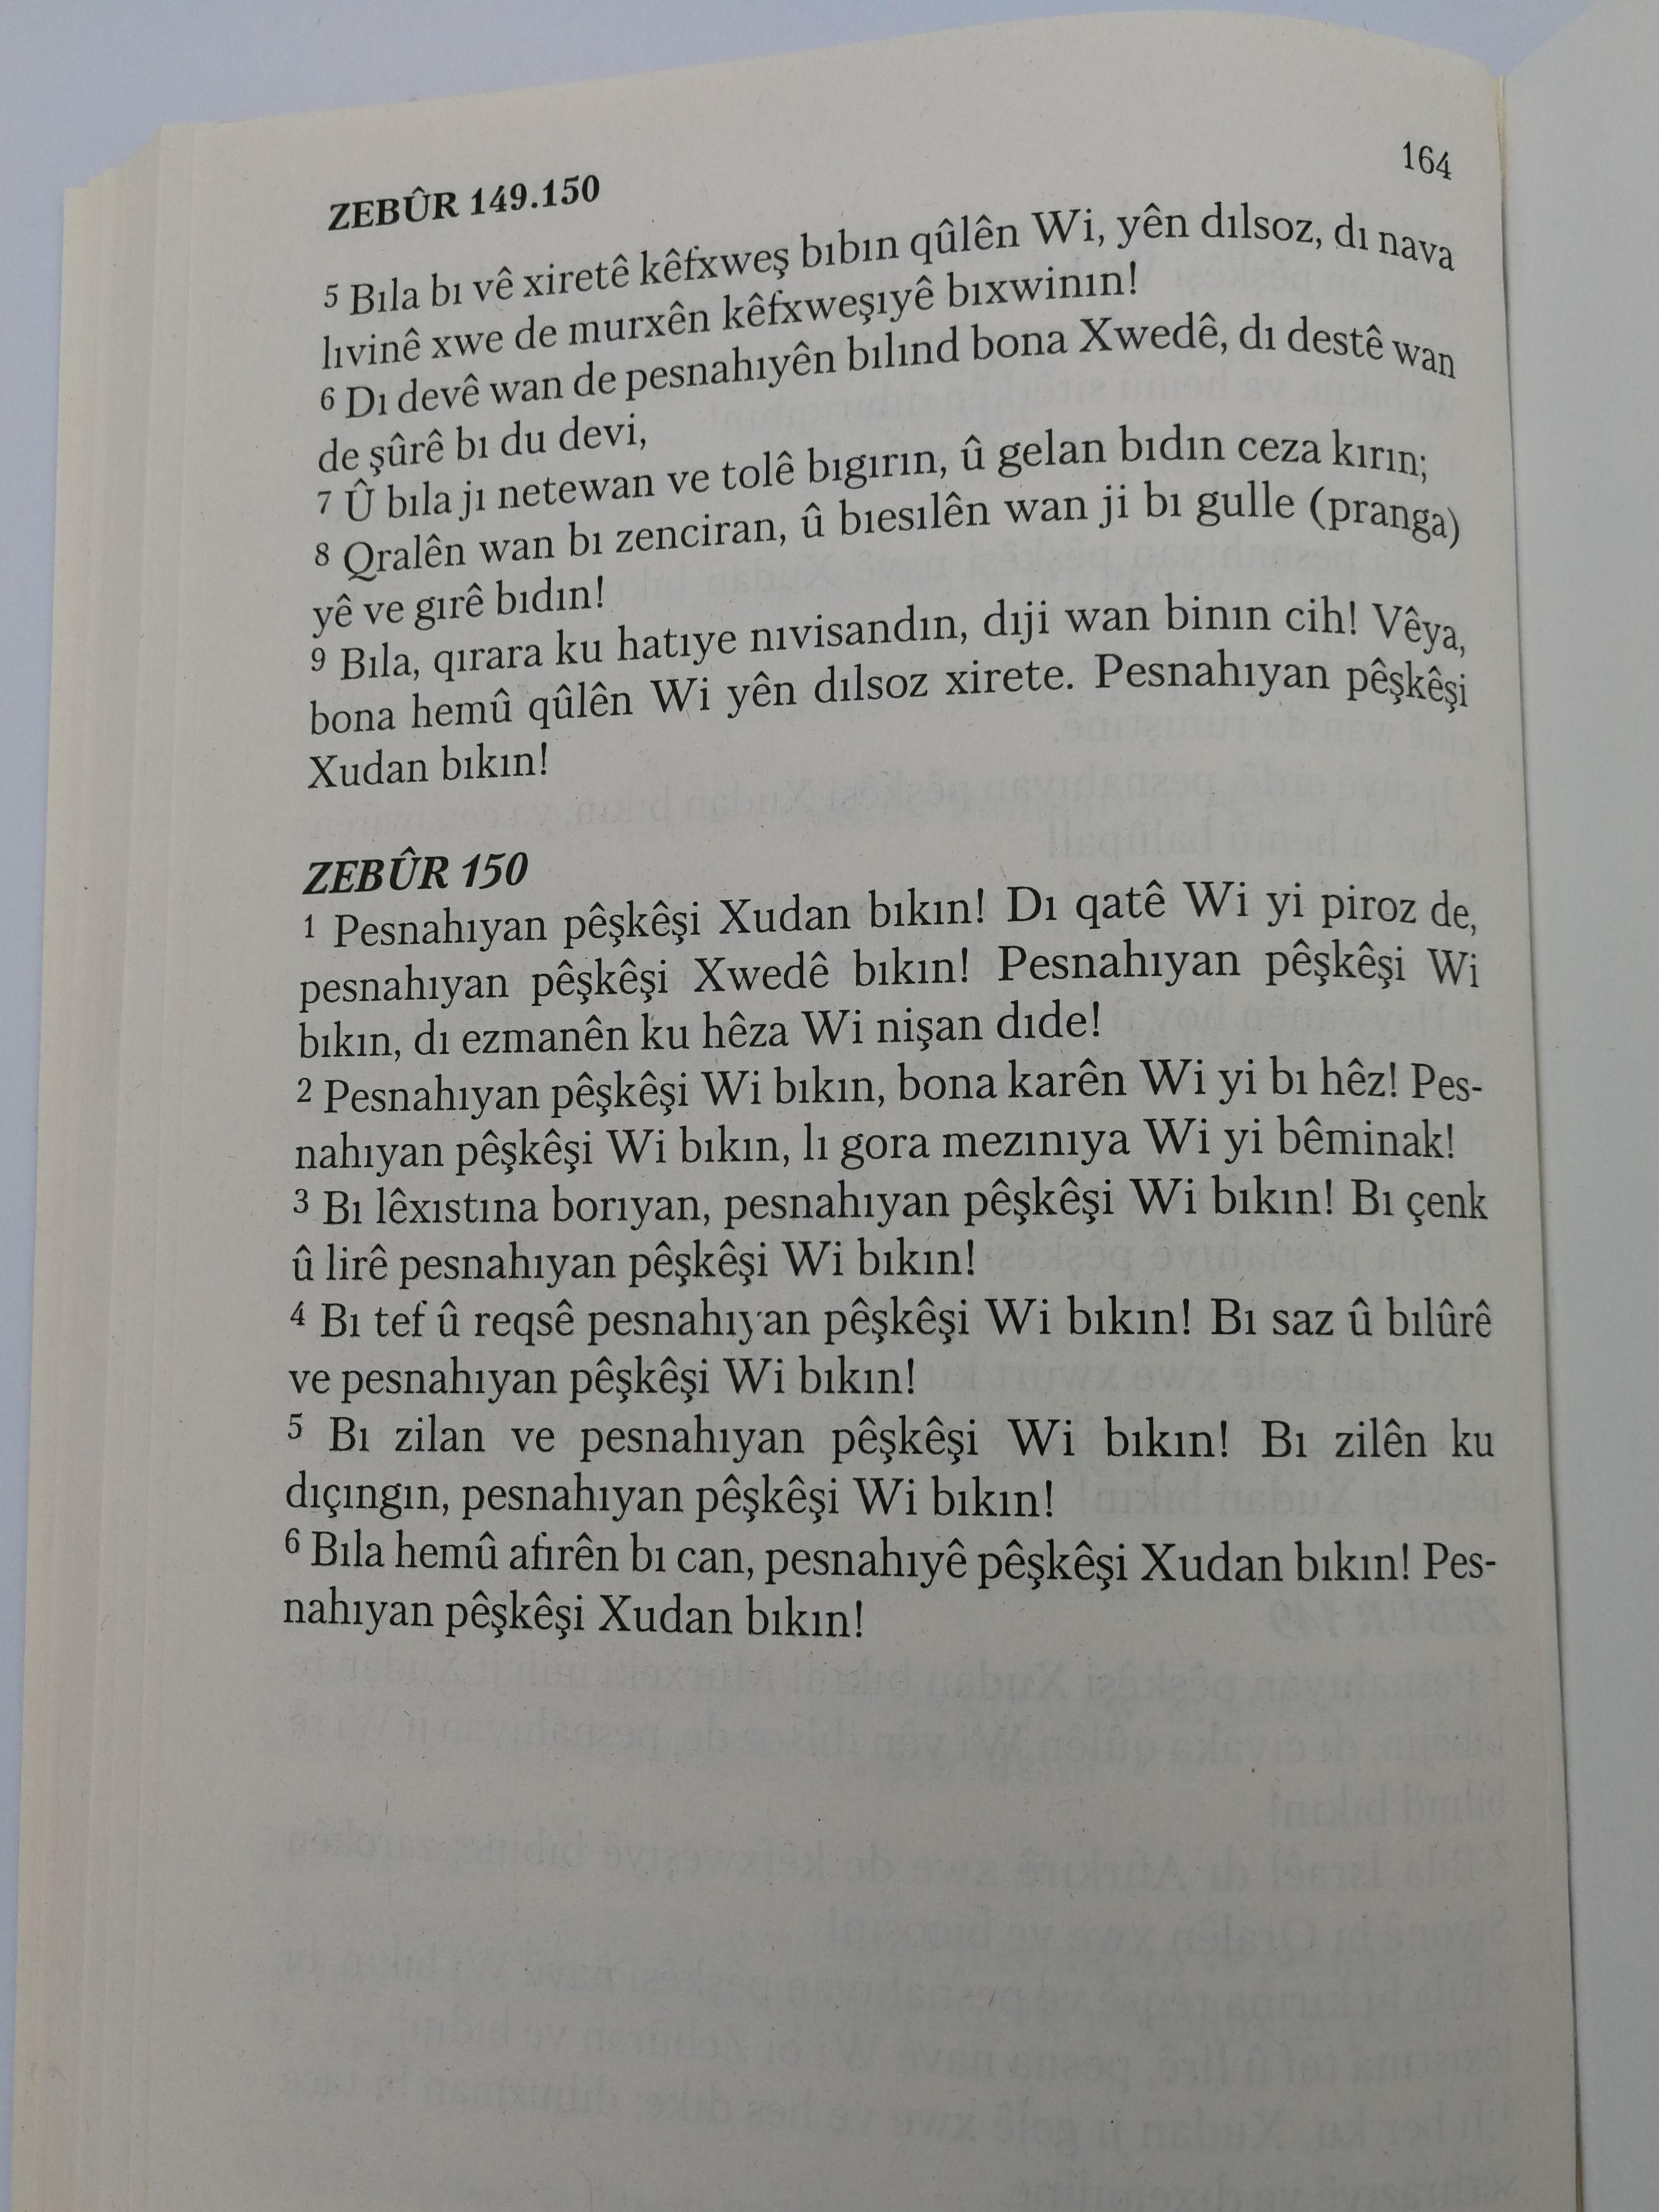 zebur-the-psalms-in-kurdish-kurmanji-8.jpg